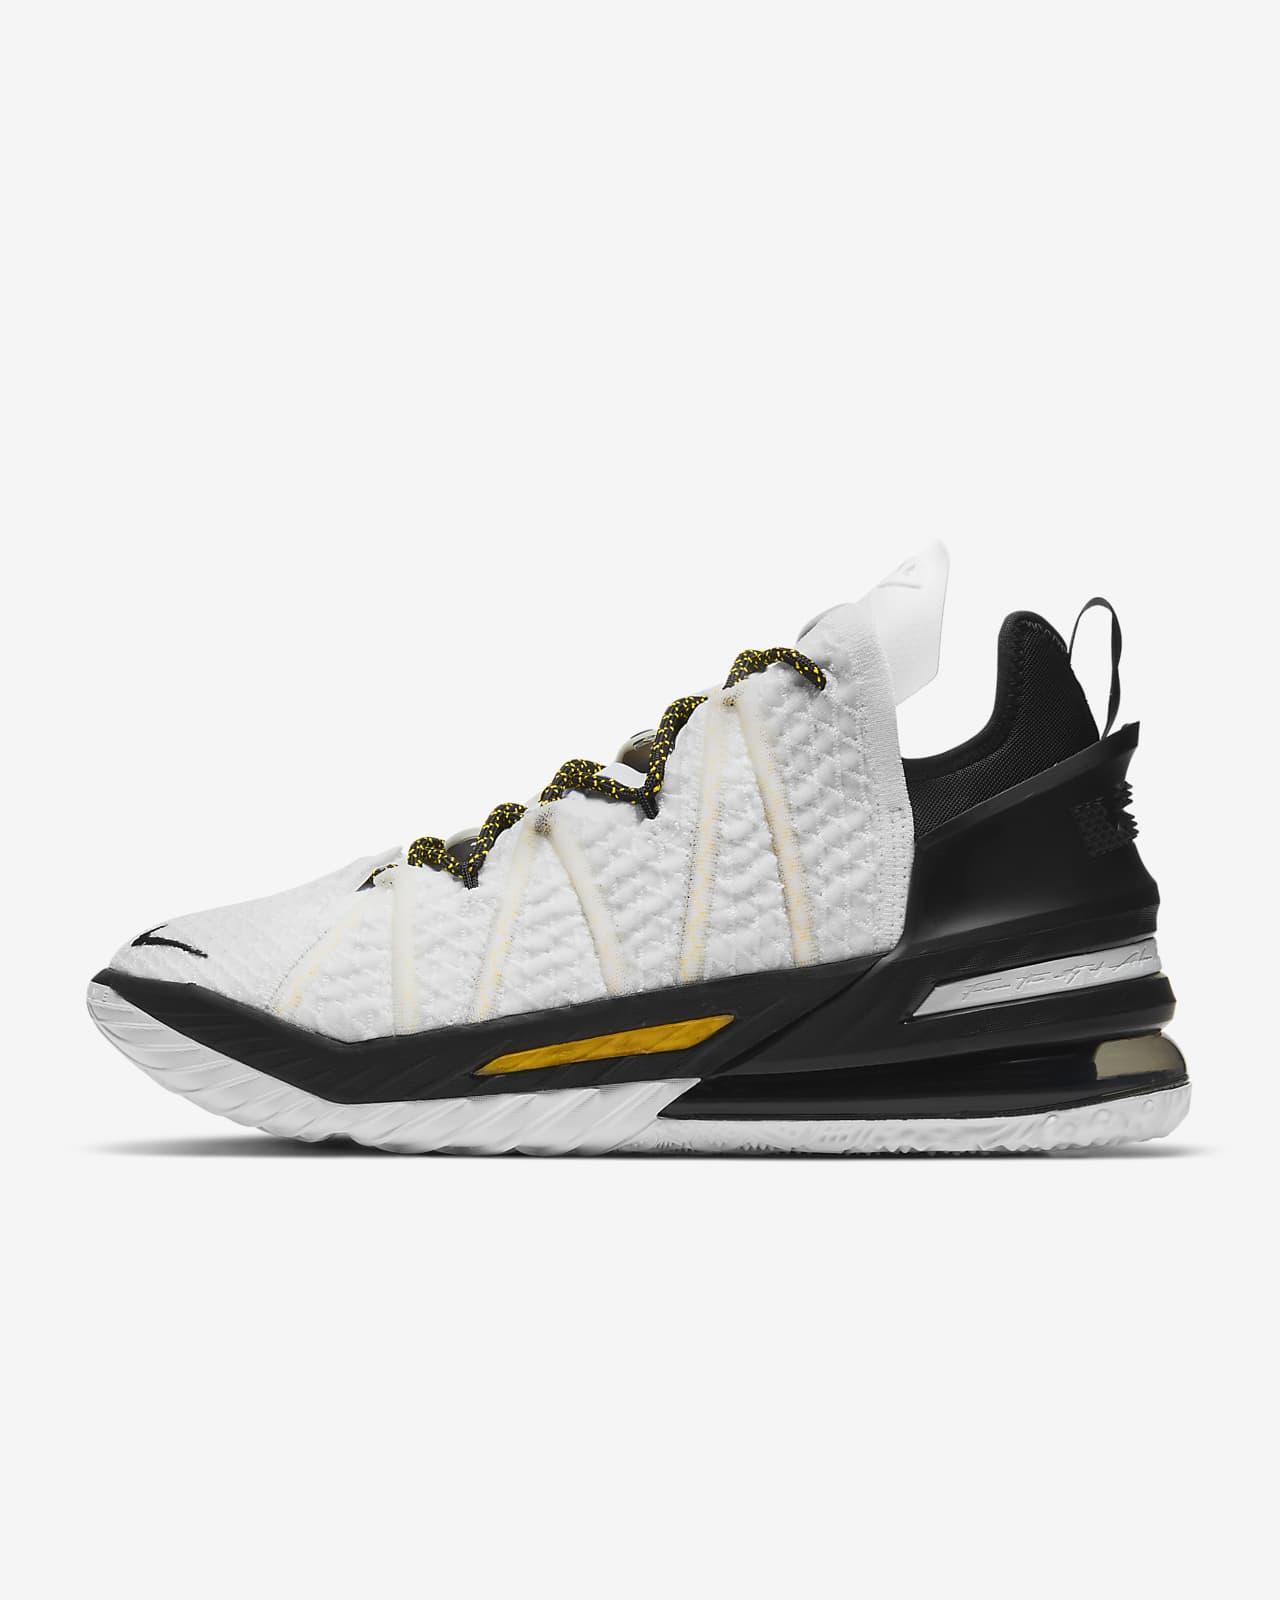 LeBron 18 'White/Black/Gold' Basketball Shoe